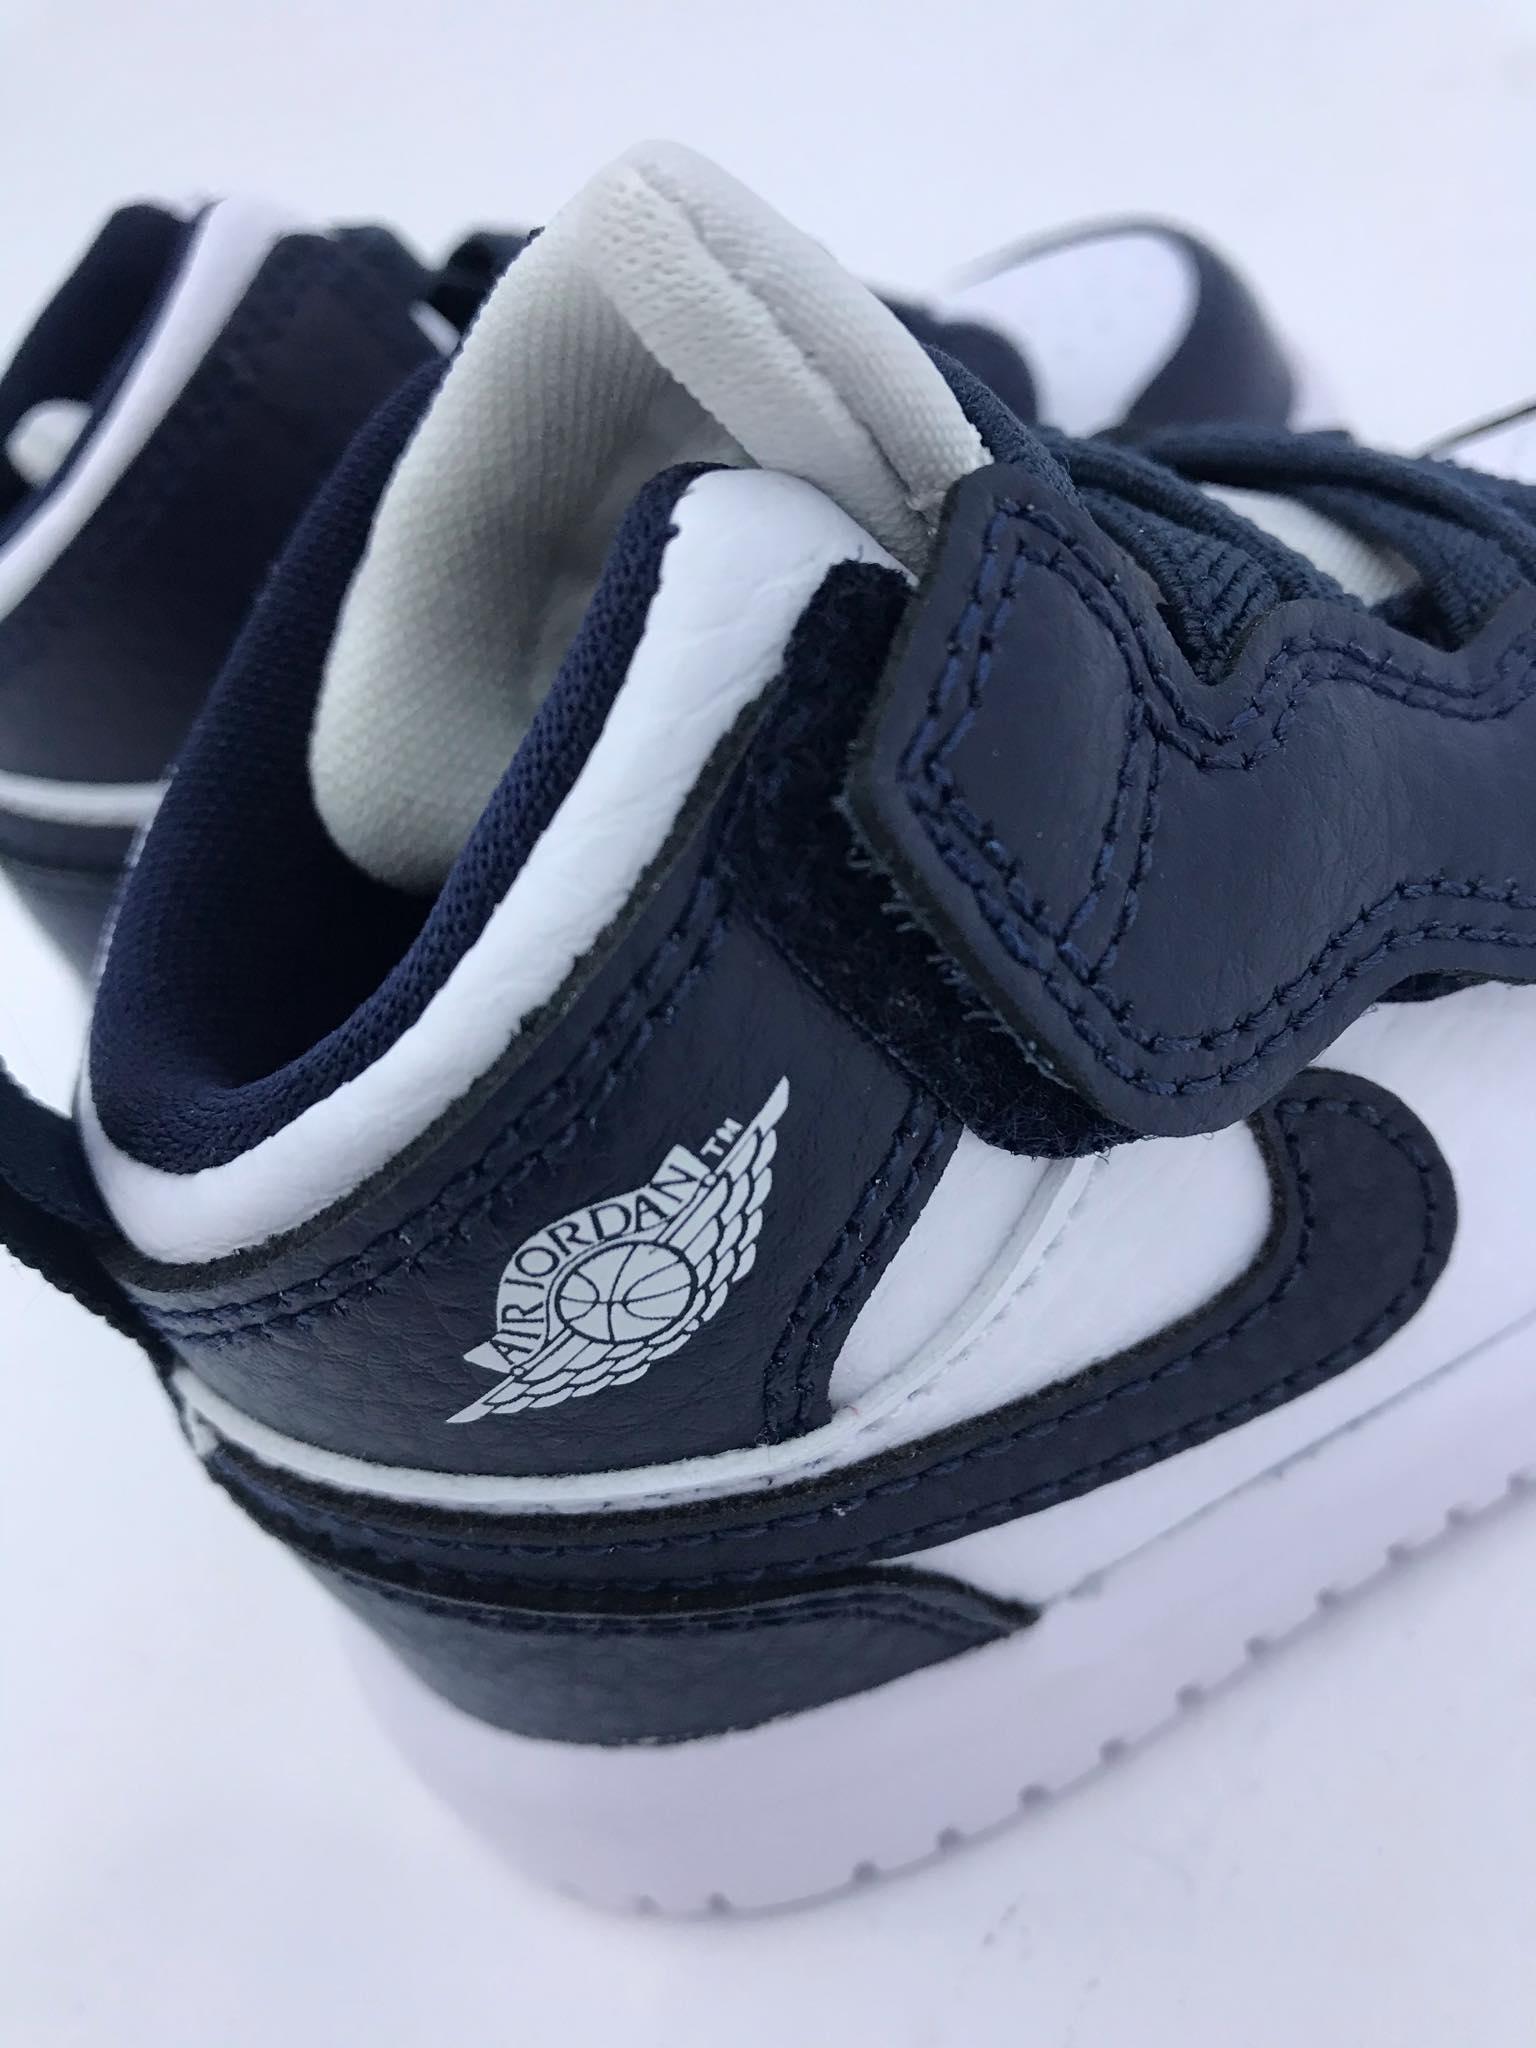 JORDAN 1 mid alt baby bambini bambino bianco blu